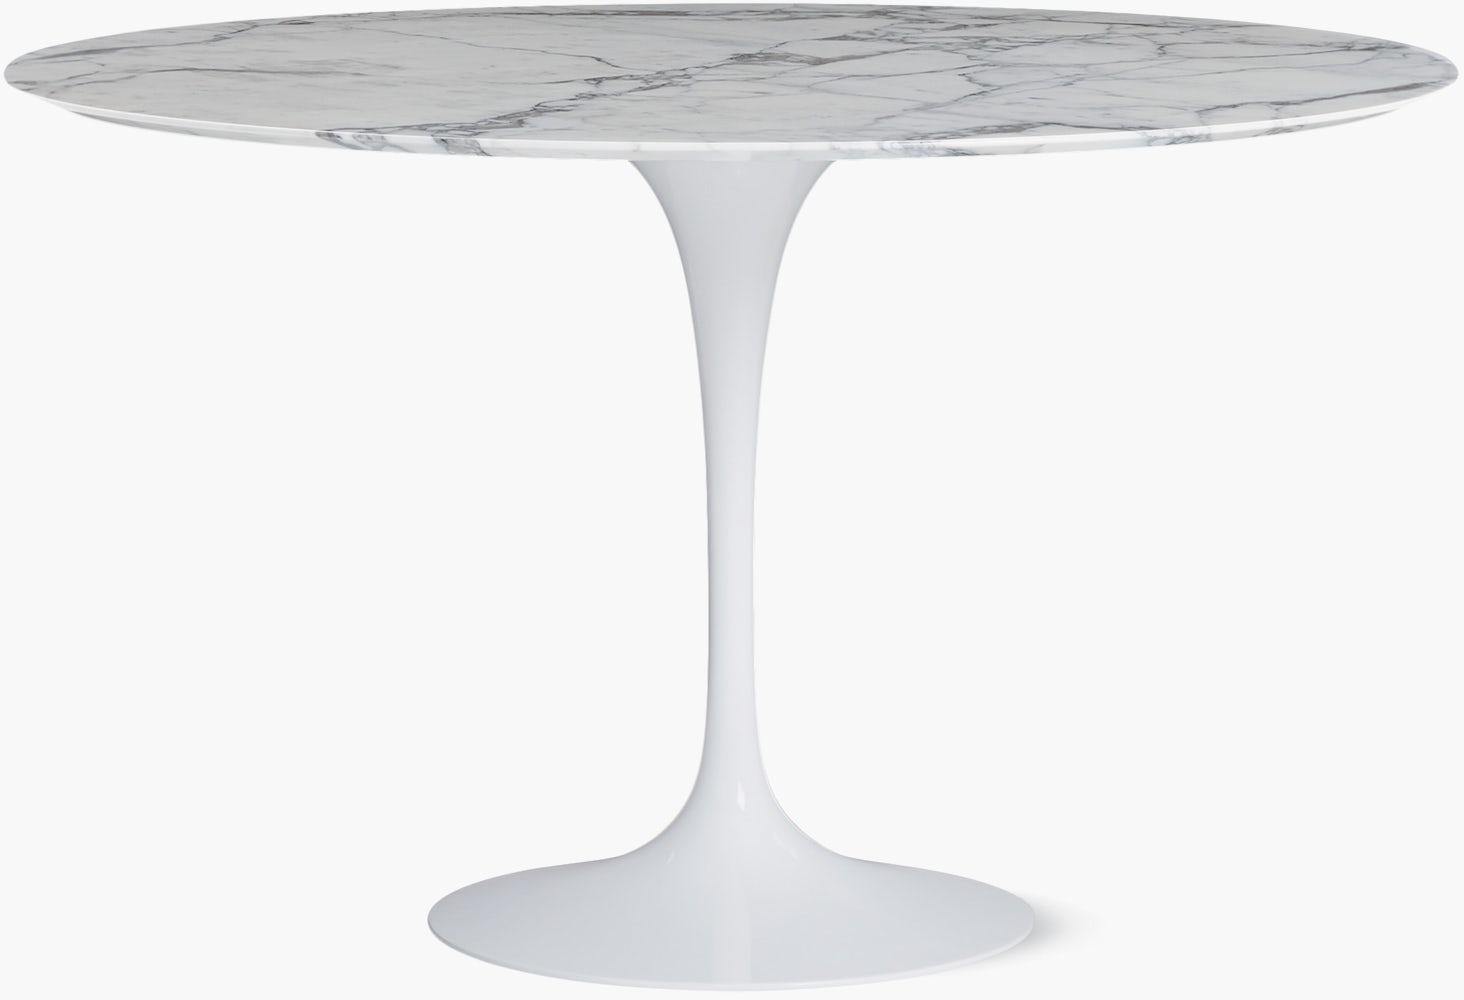 Saarinen Dining Table - Design Within Reach